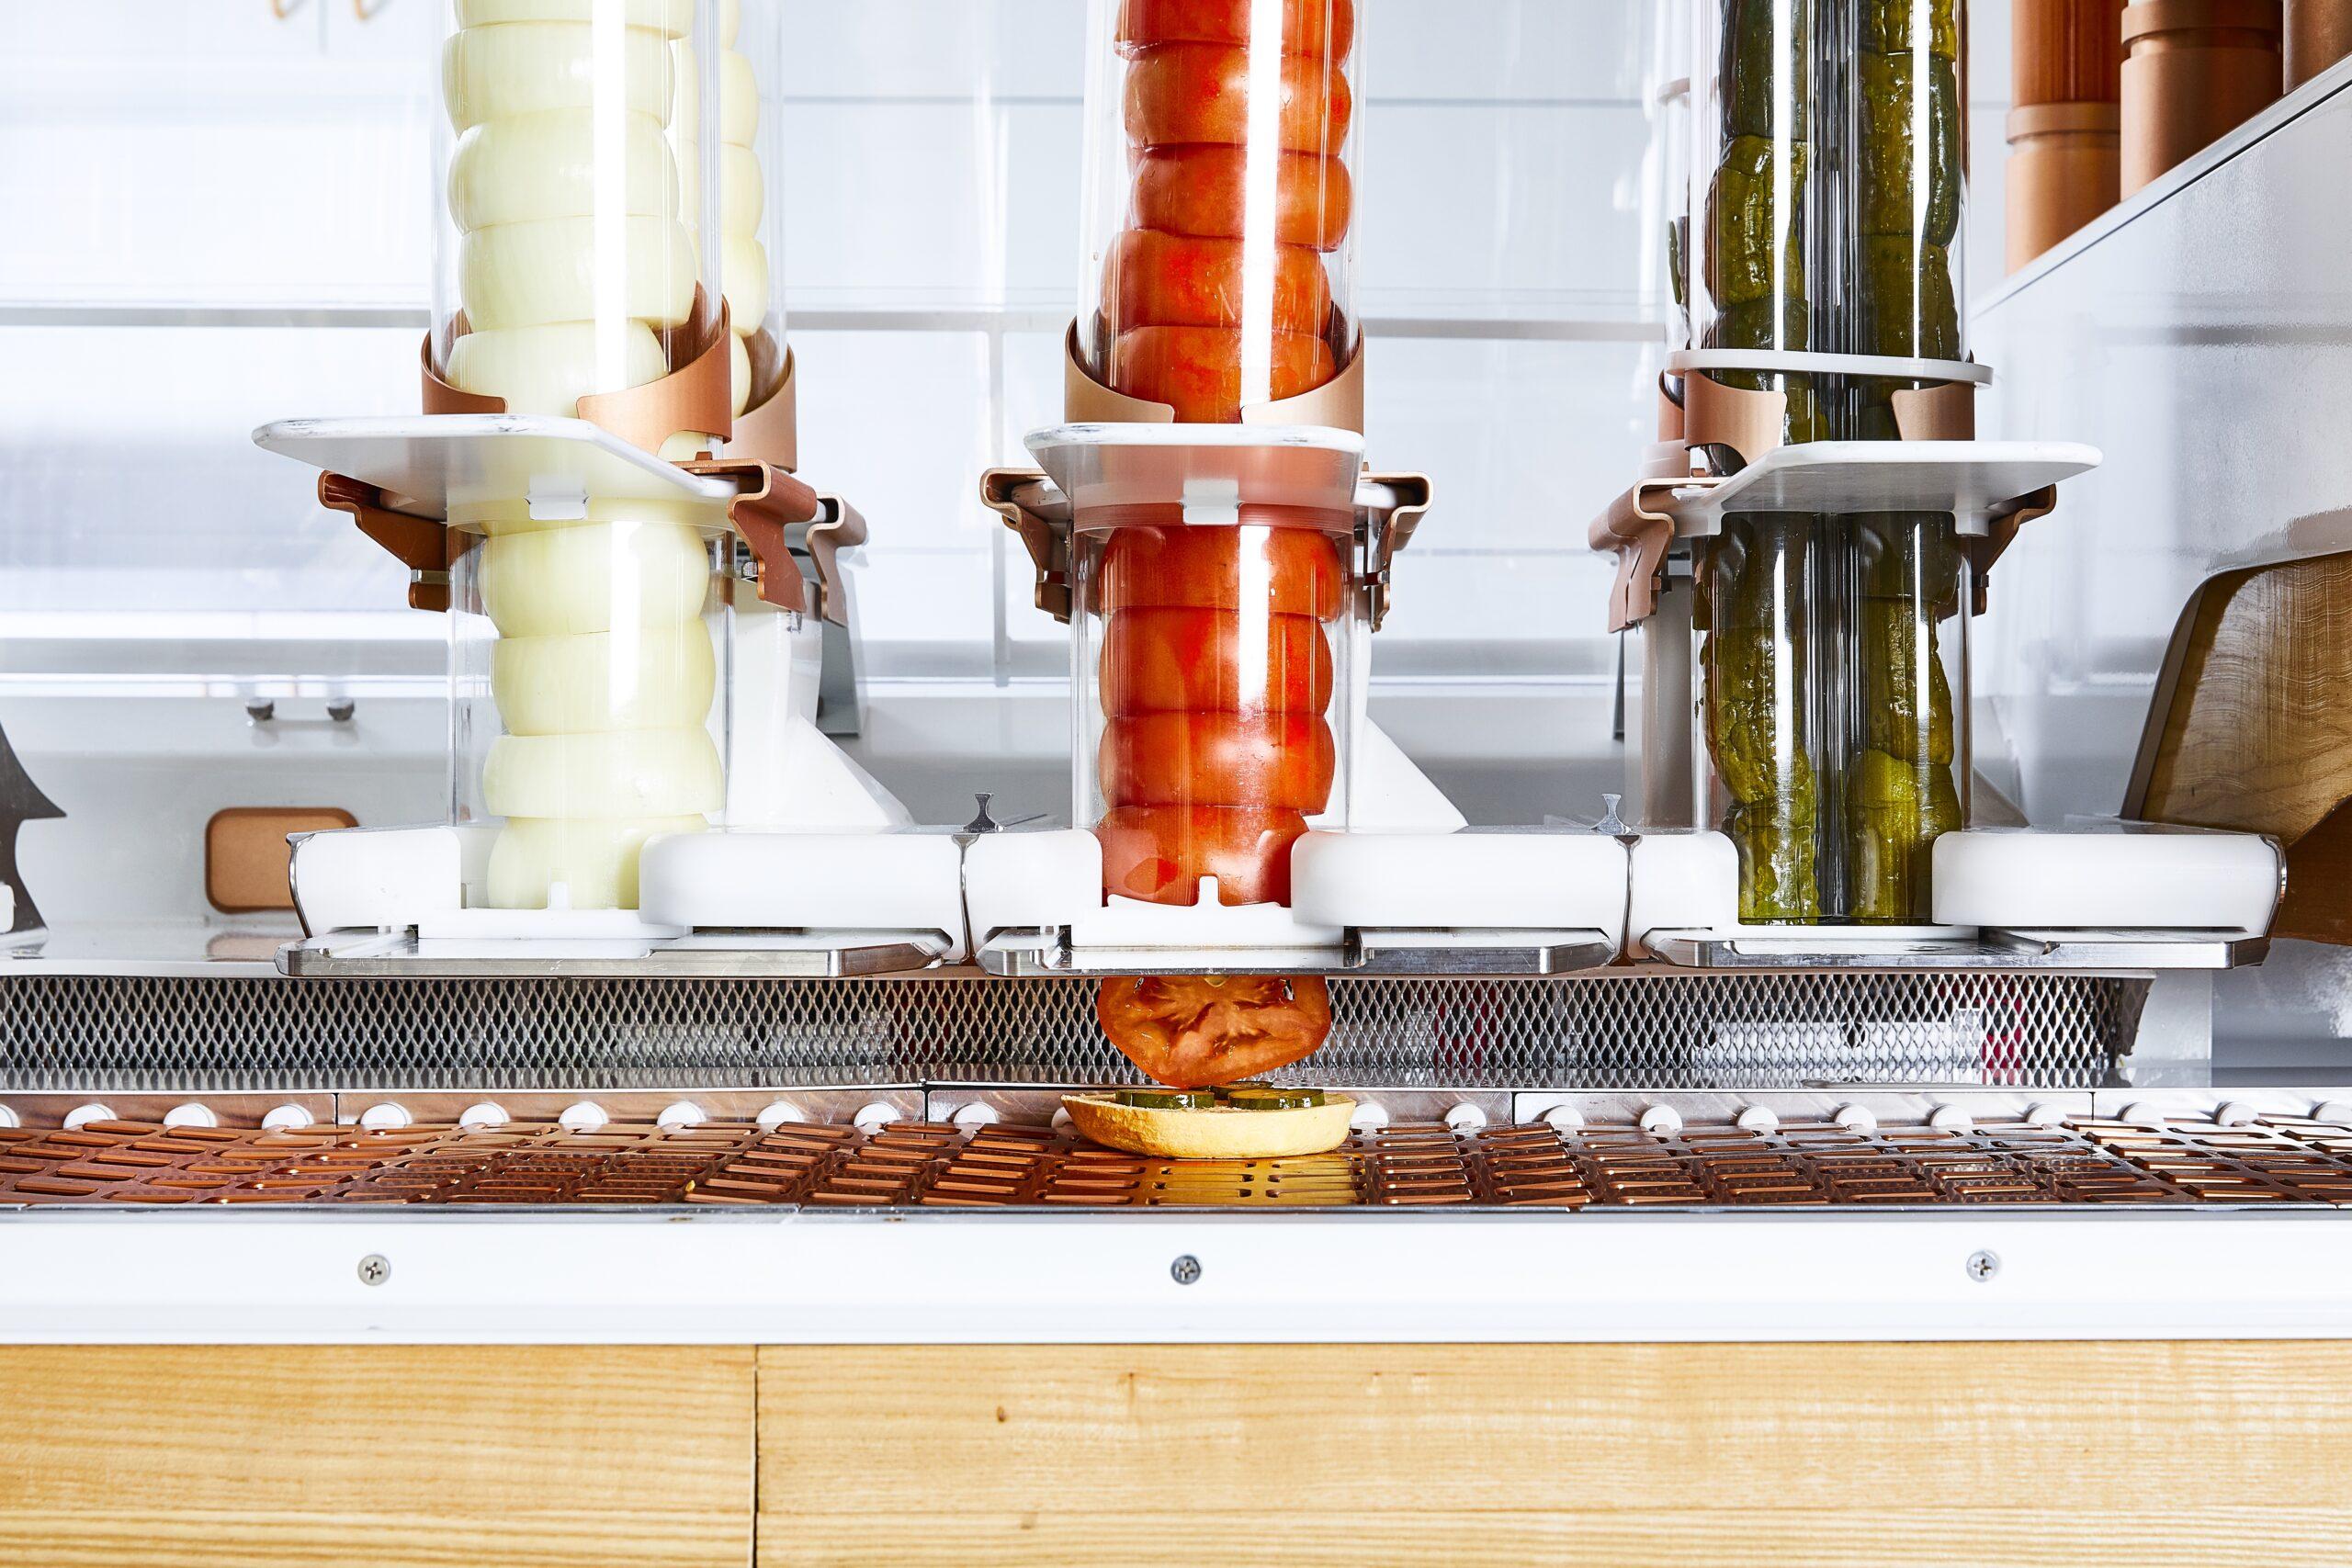 Creator robotic kitchen